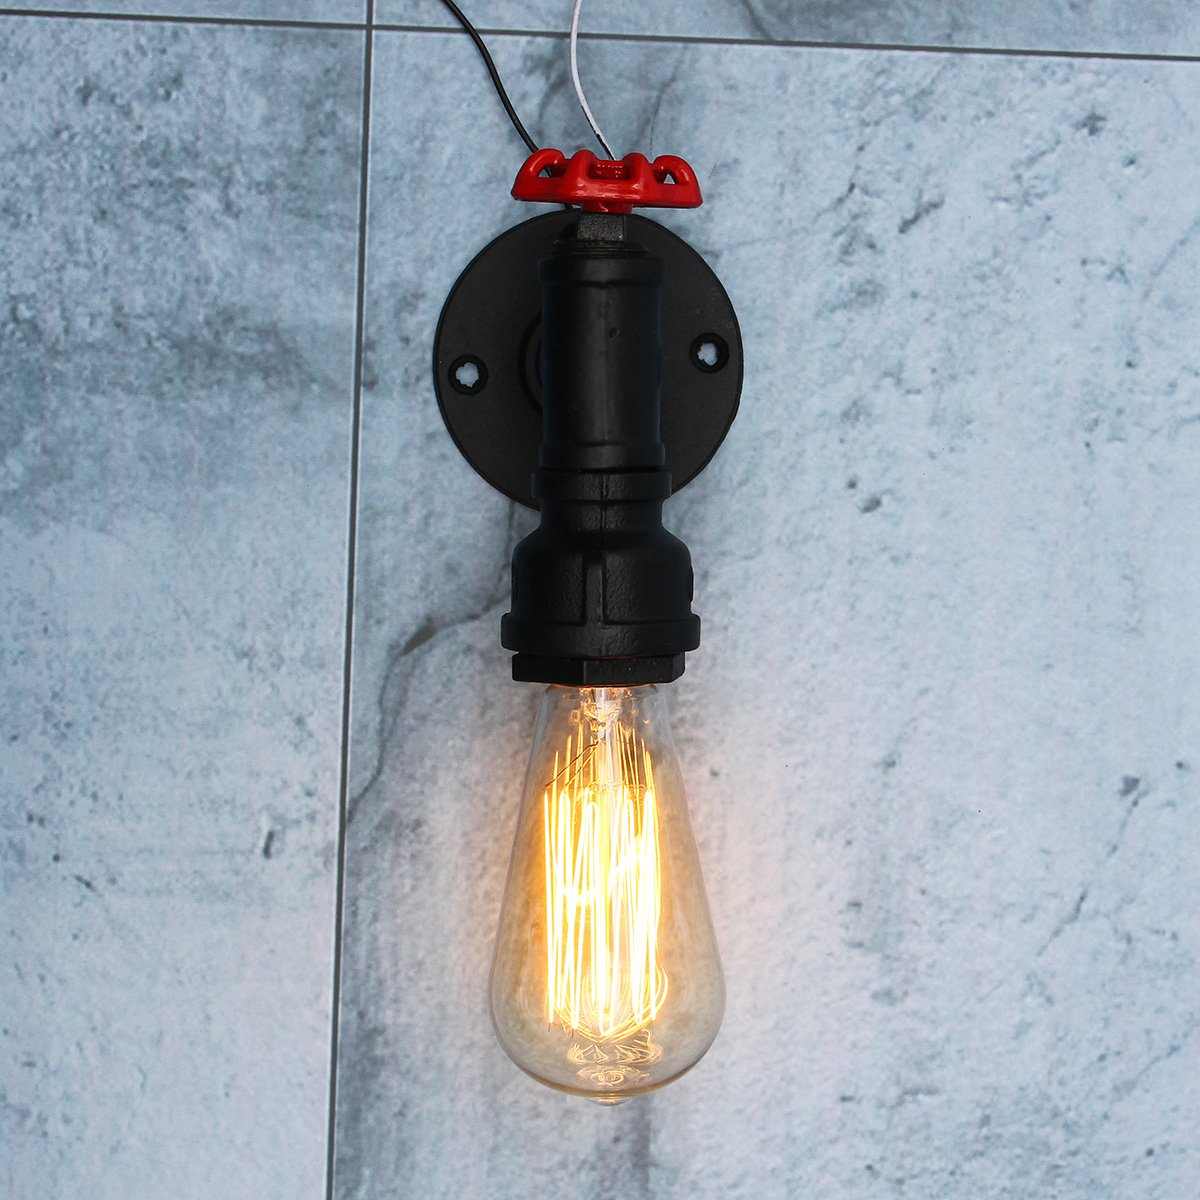 Jeteven Wandlampe E27 Lampefassung Metall Vintage Wandleuchte Retro Industriell loft Stil für Büro Korridor Restaurant Keller Untergeschoss usw, Max. 60W (Schwarz B)